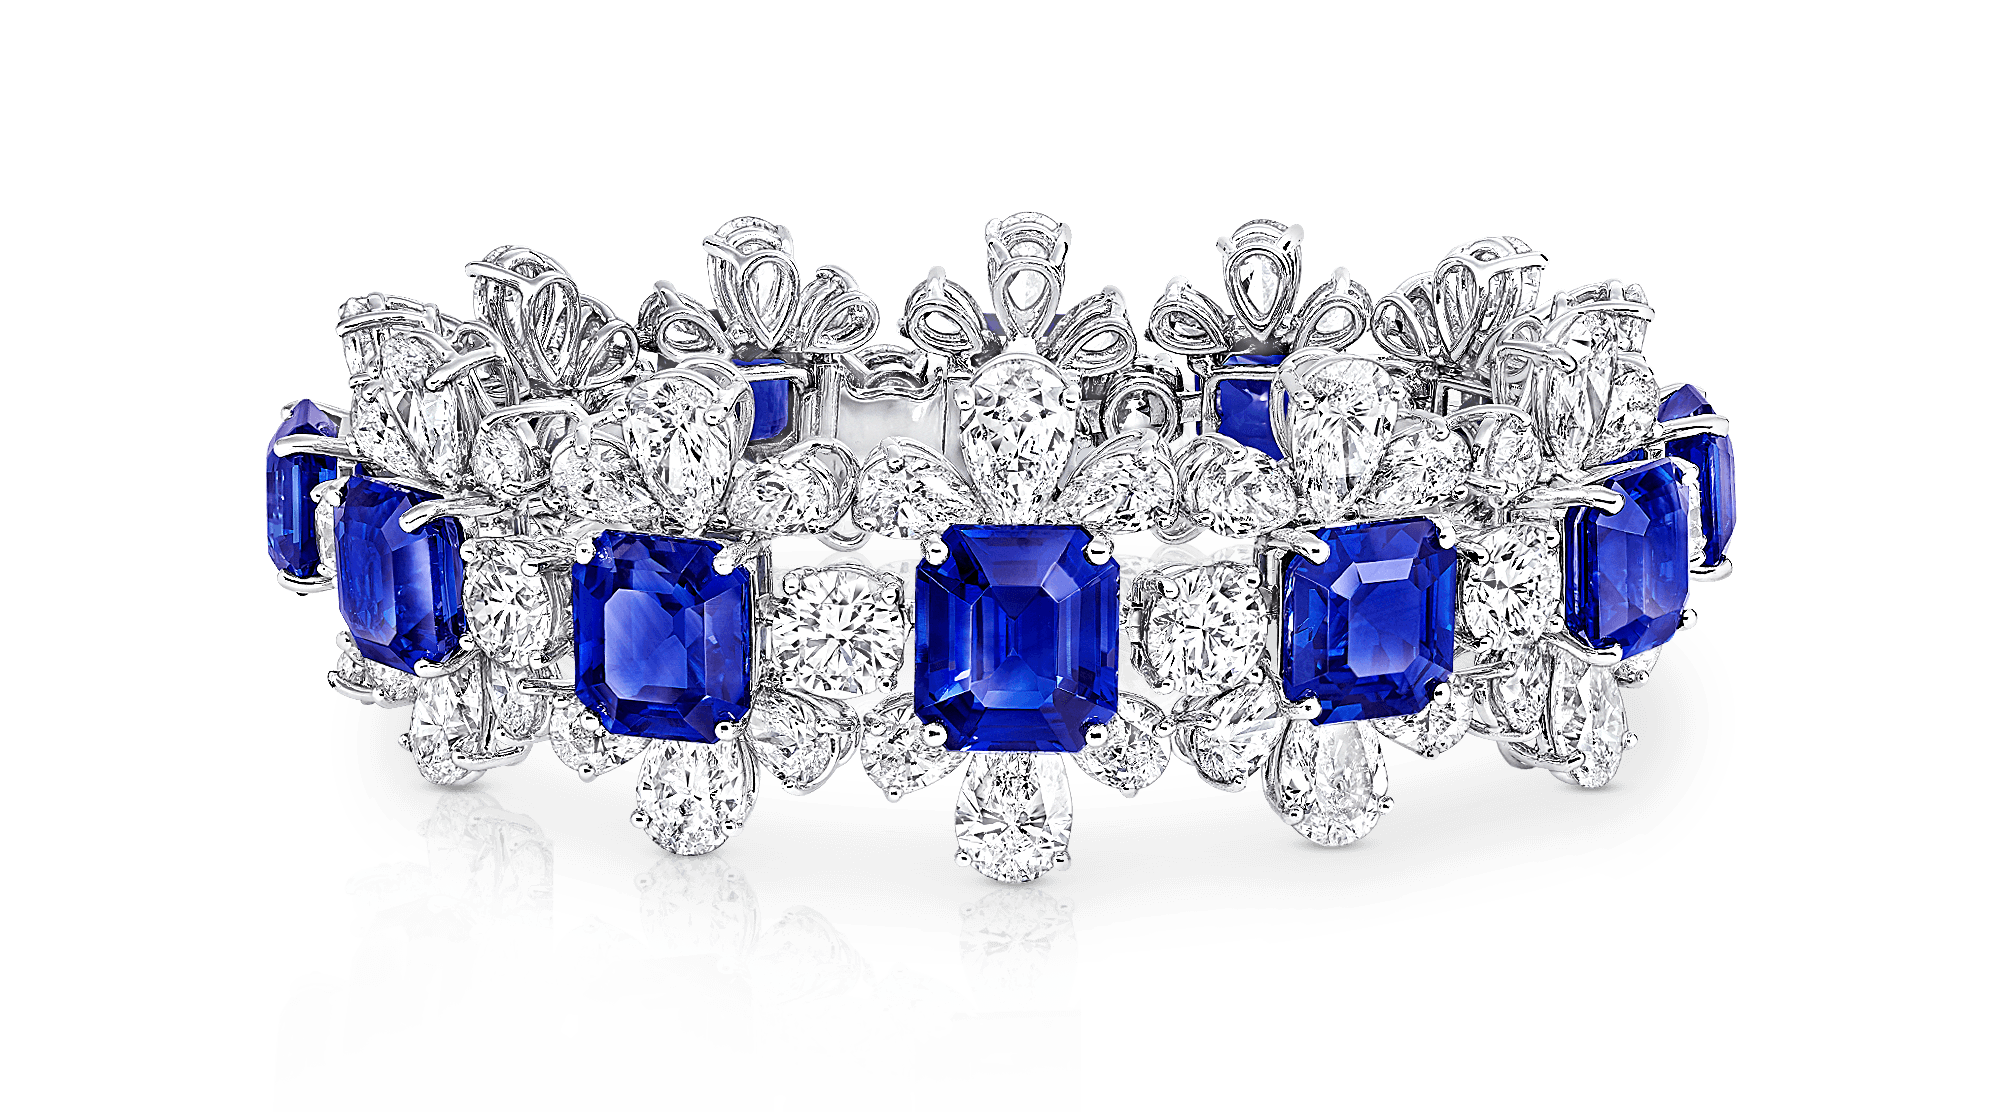 A Graff sapphire and white diamond high jewellery bracelet